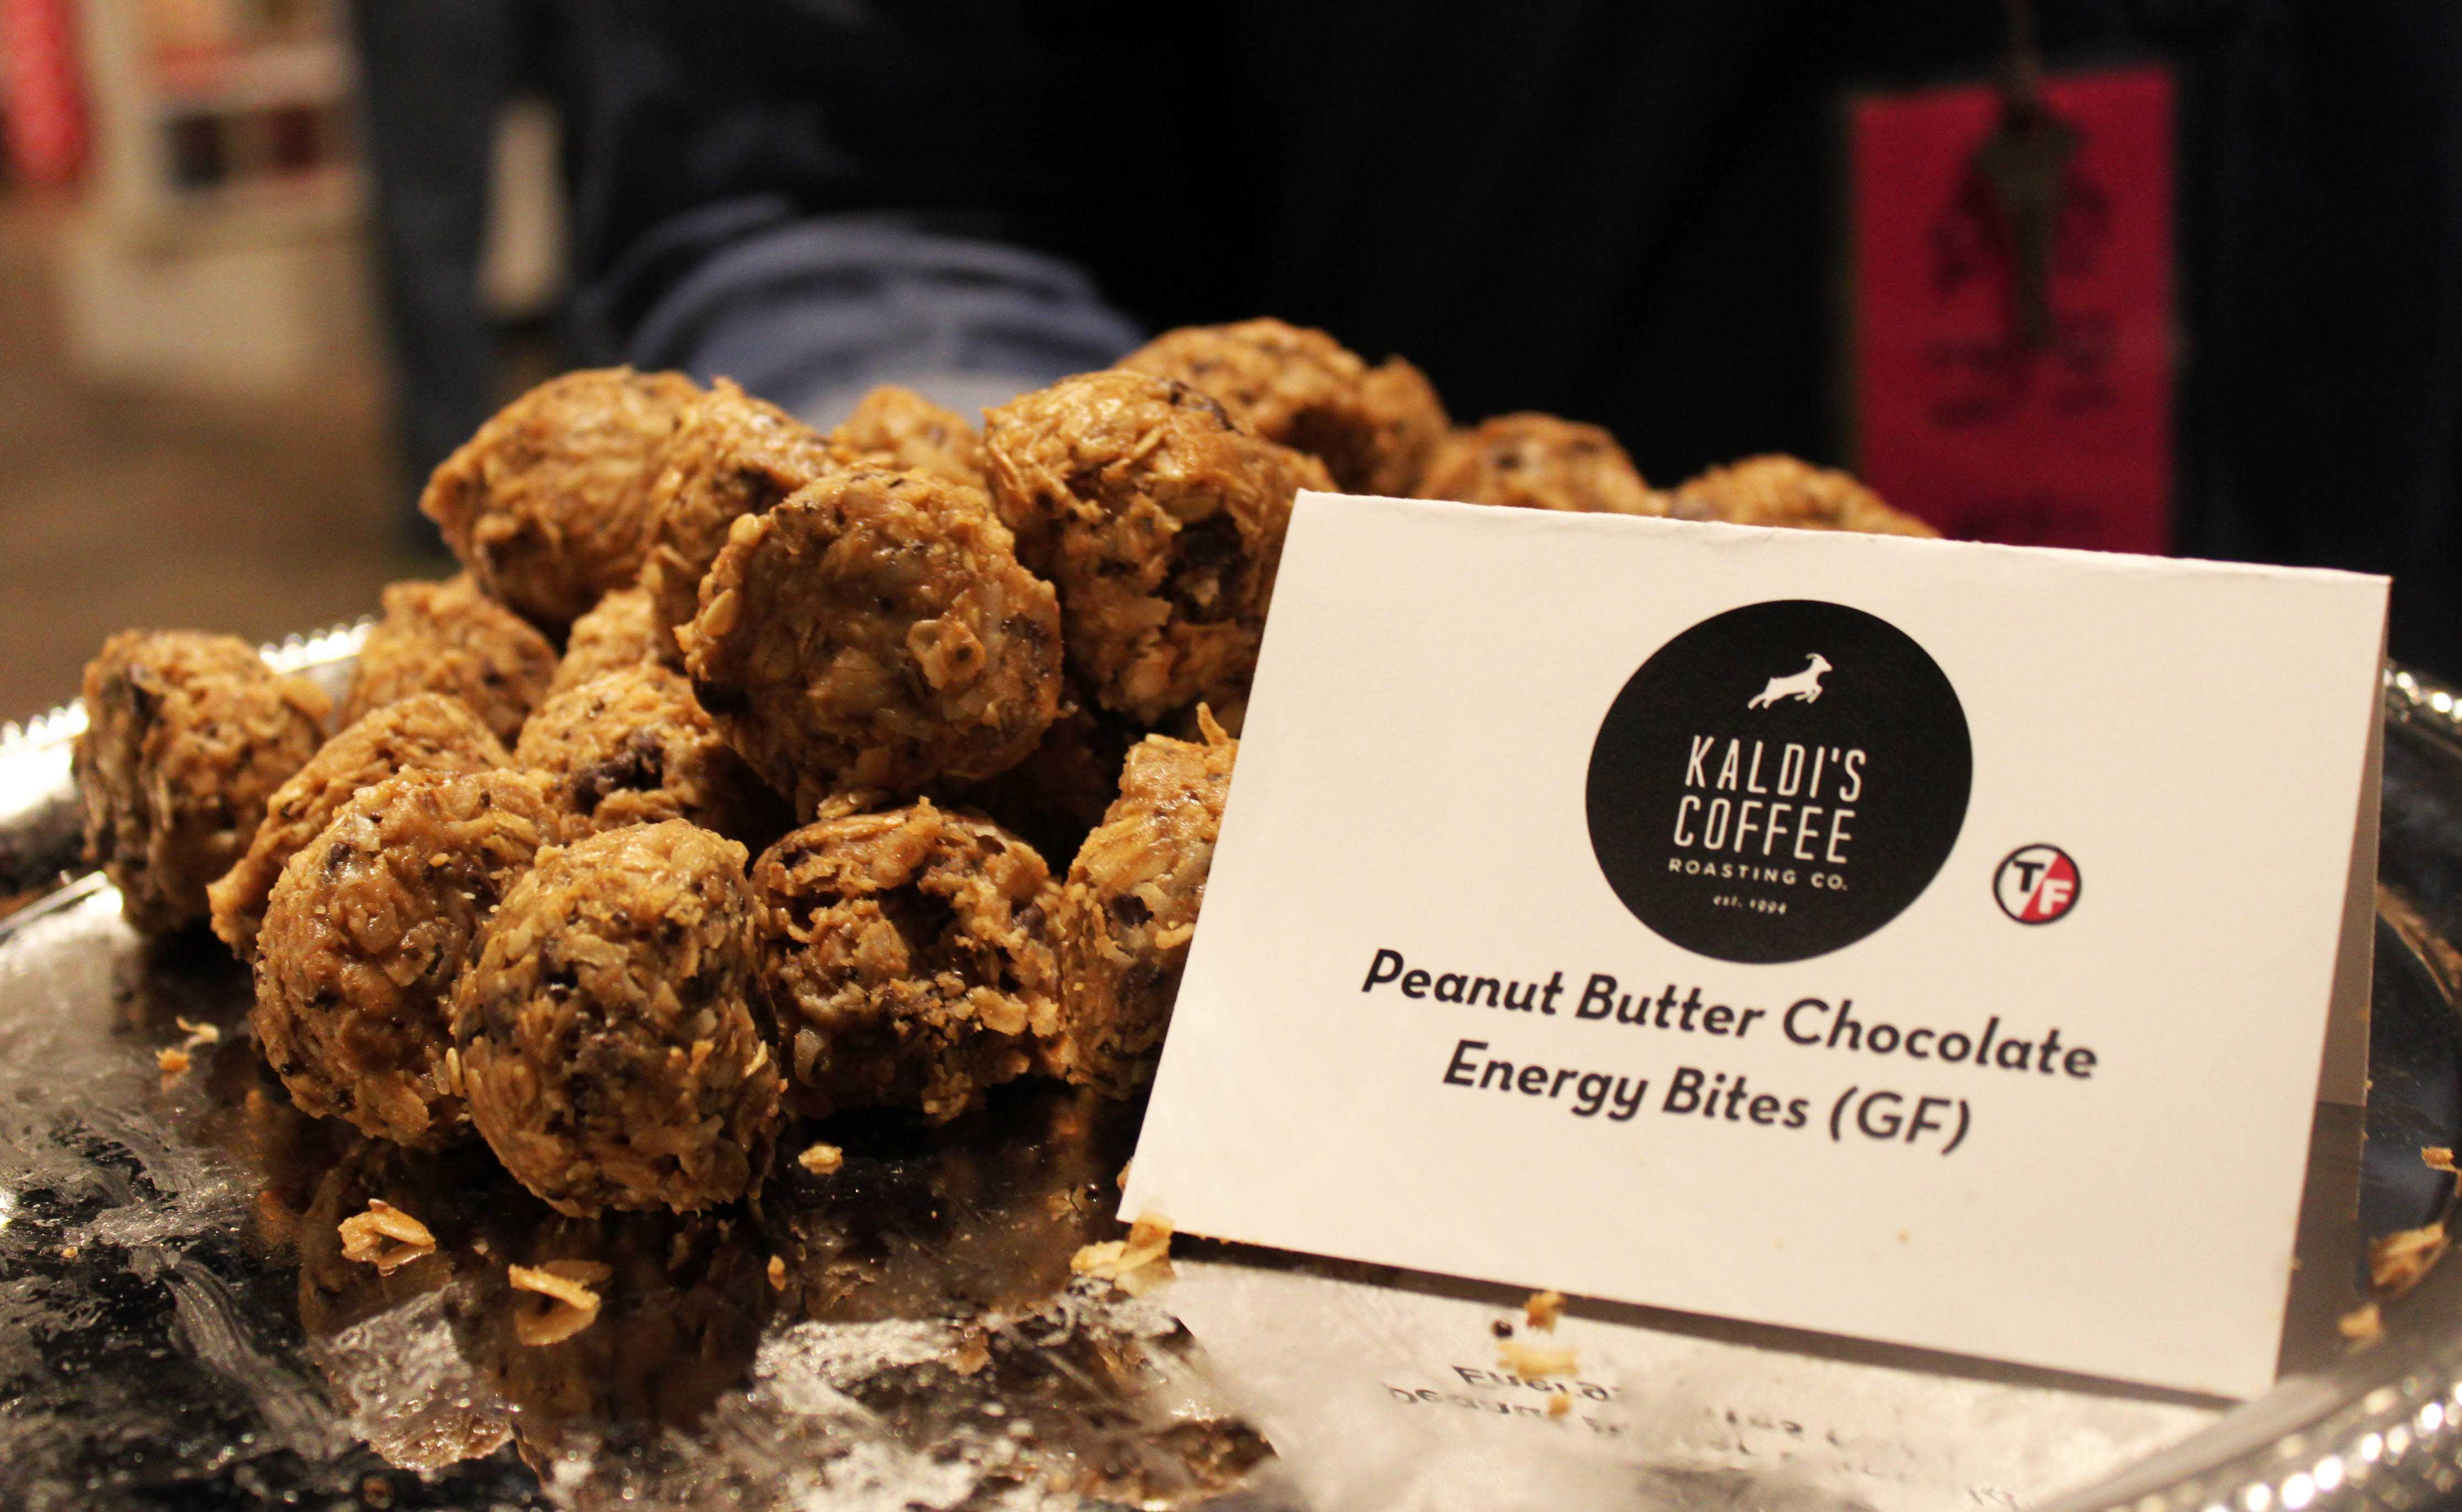 Kaldi's Coffee's simple peanut butter treats were a popular grab.